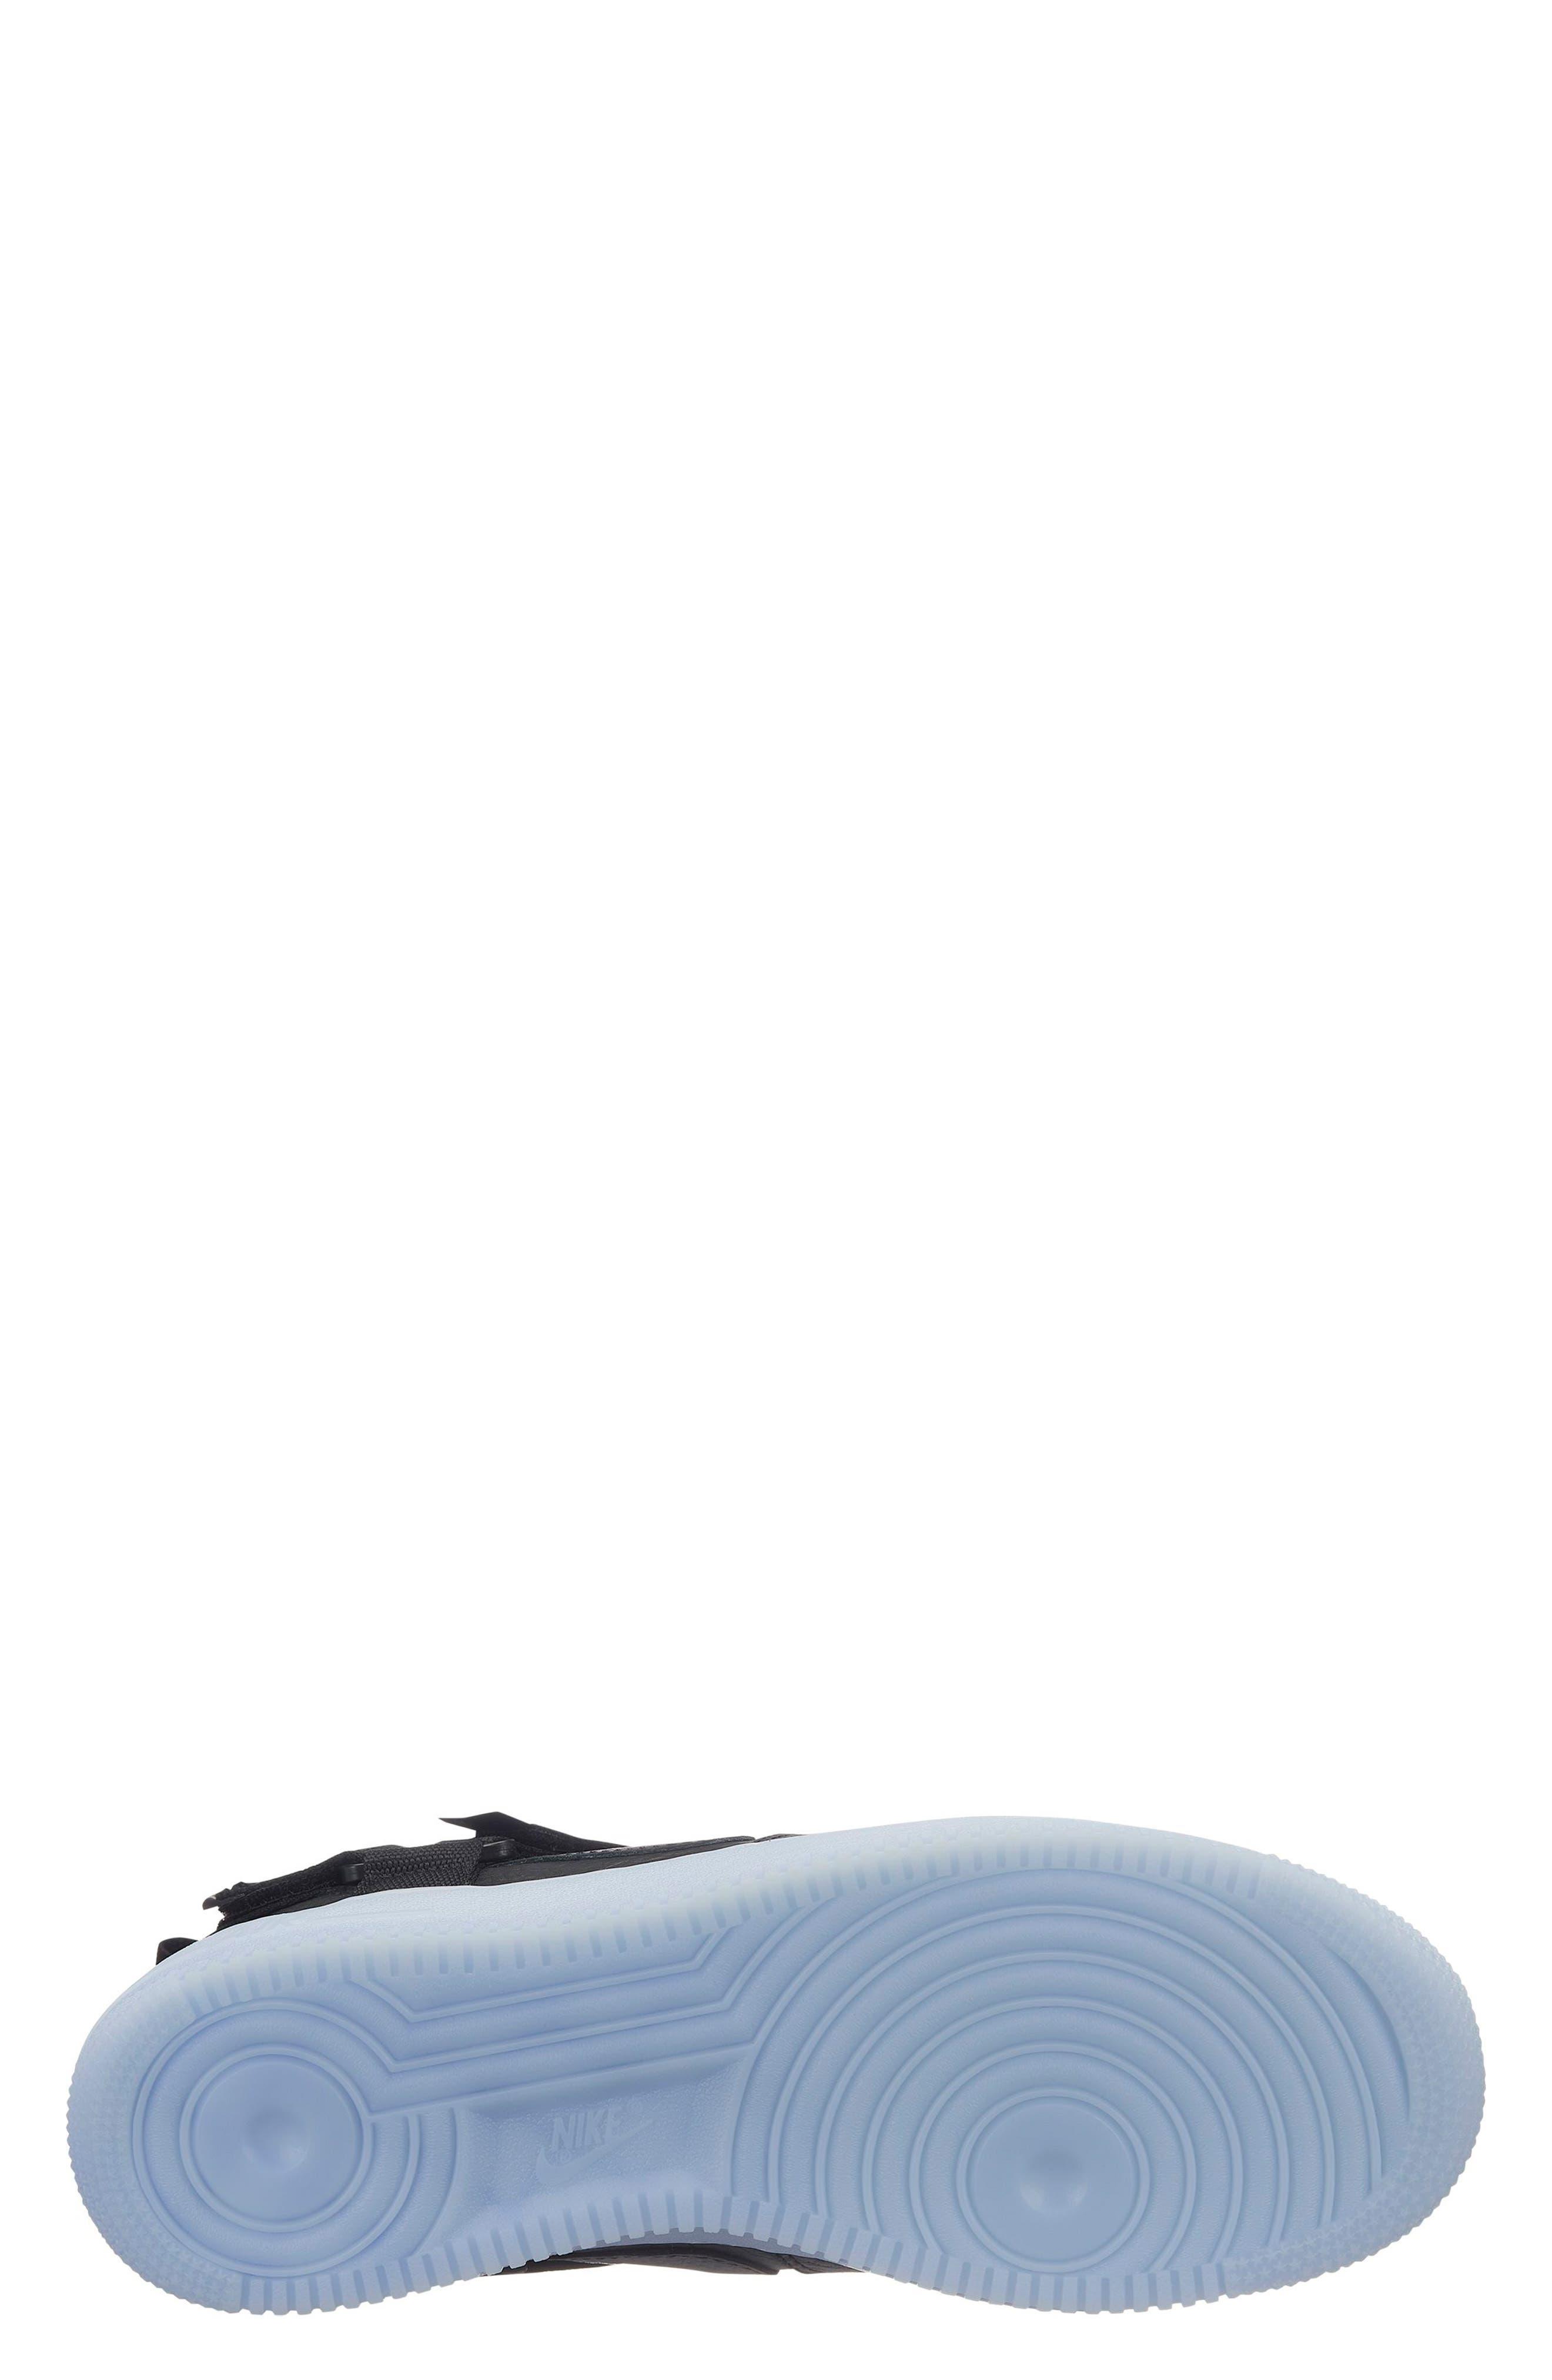 Air Force 1 Utility Mid Sneaker,                             Alternate thumbnail 2, color,                             BLACK/ HALF BLUE/ WHITE